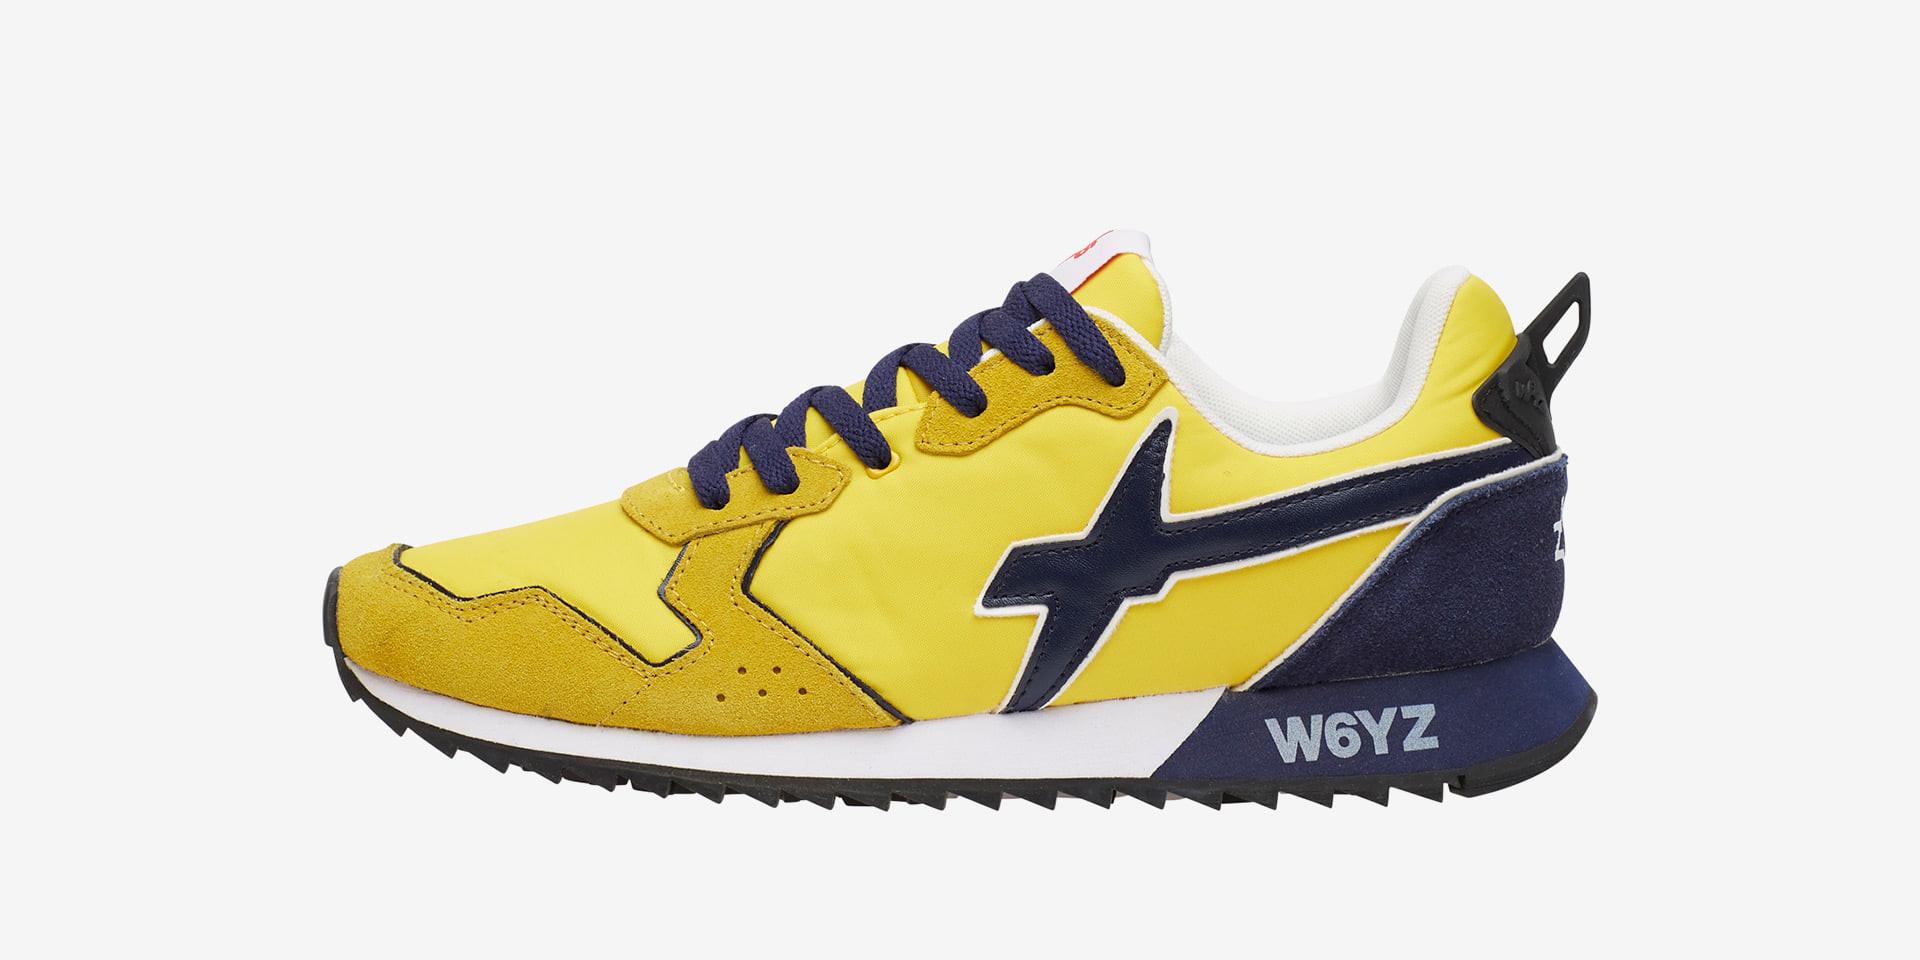 JET-M. - Sneaker in suede e nylon - Giallo-Navy